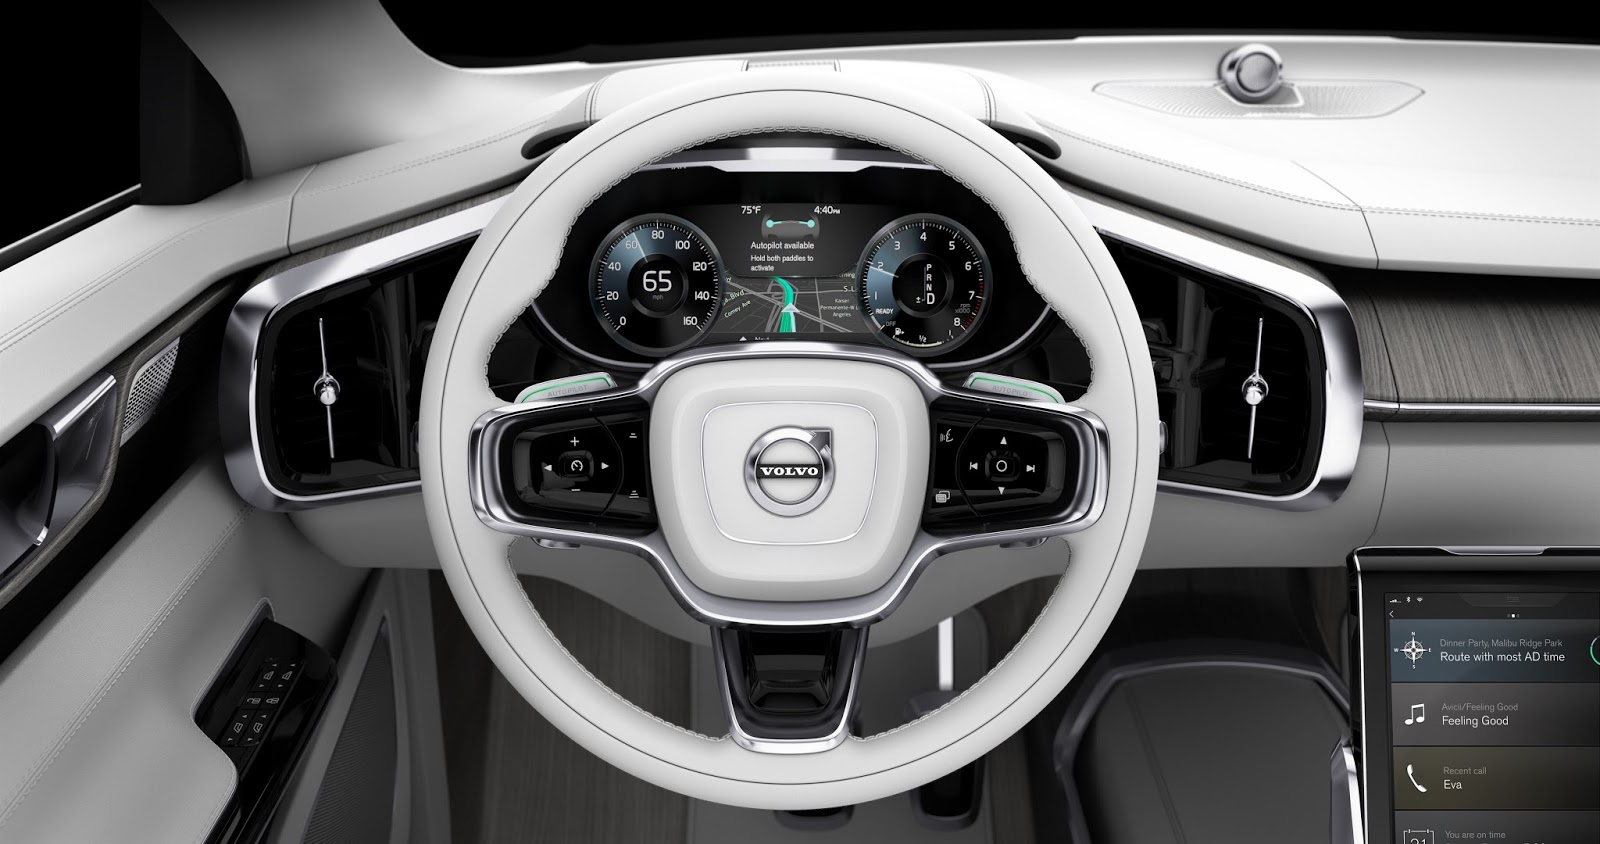 169540 Concept 26 Η Volvo θα κάνει και την αυτόνομη οδήγηση διασκεδαστική Autonomous Driving, Volvo, Volvo XC90, Αυτόνομη οδήγηση